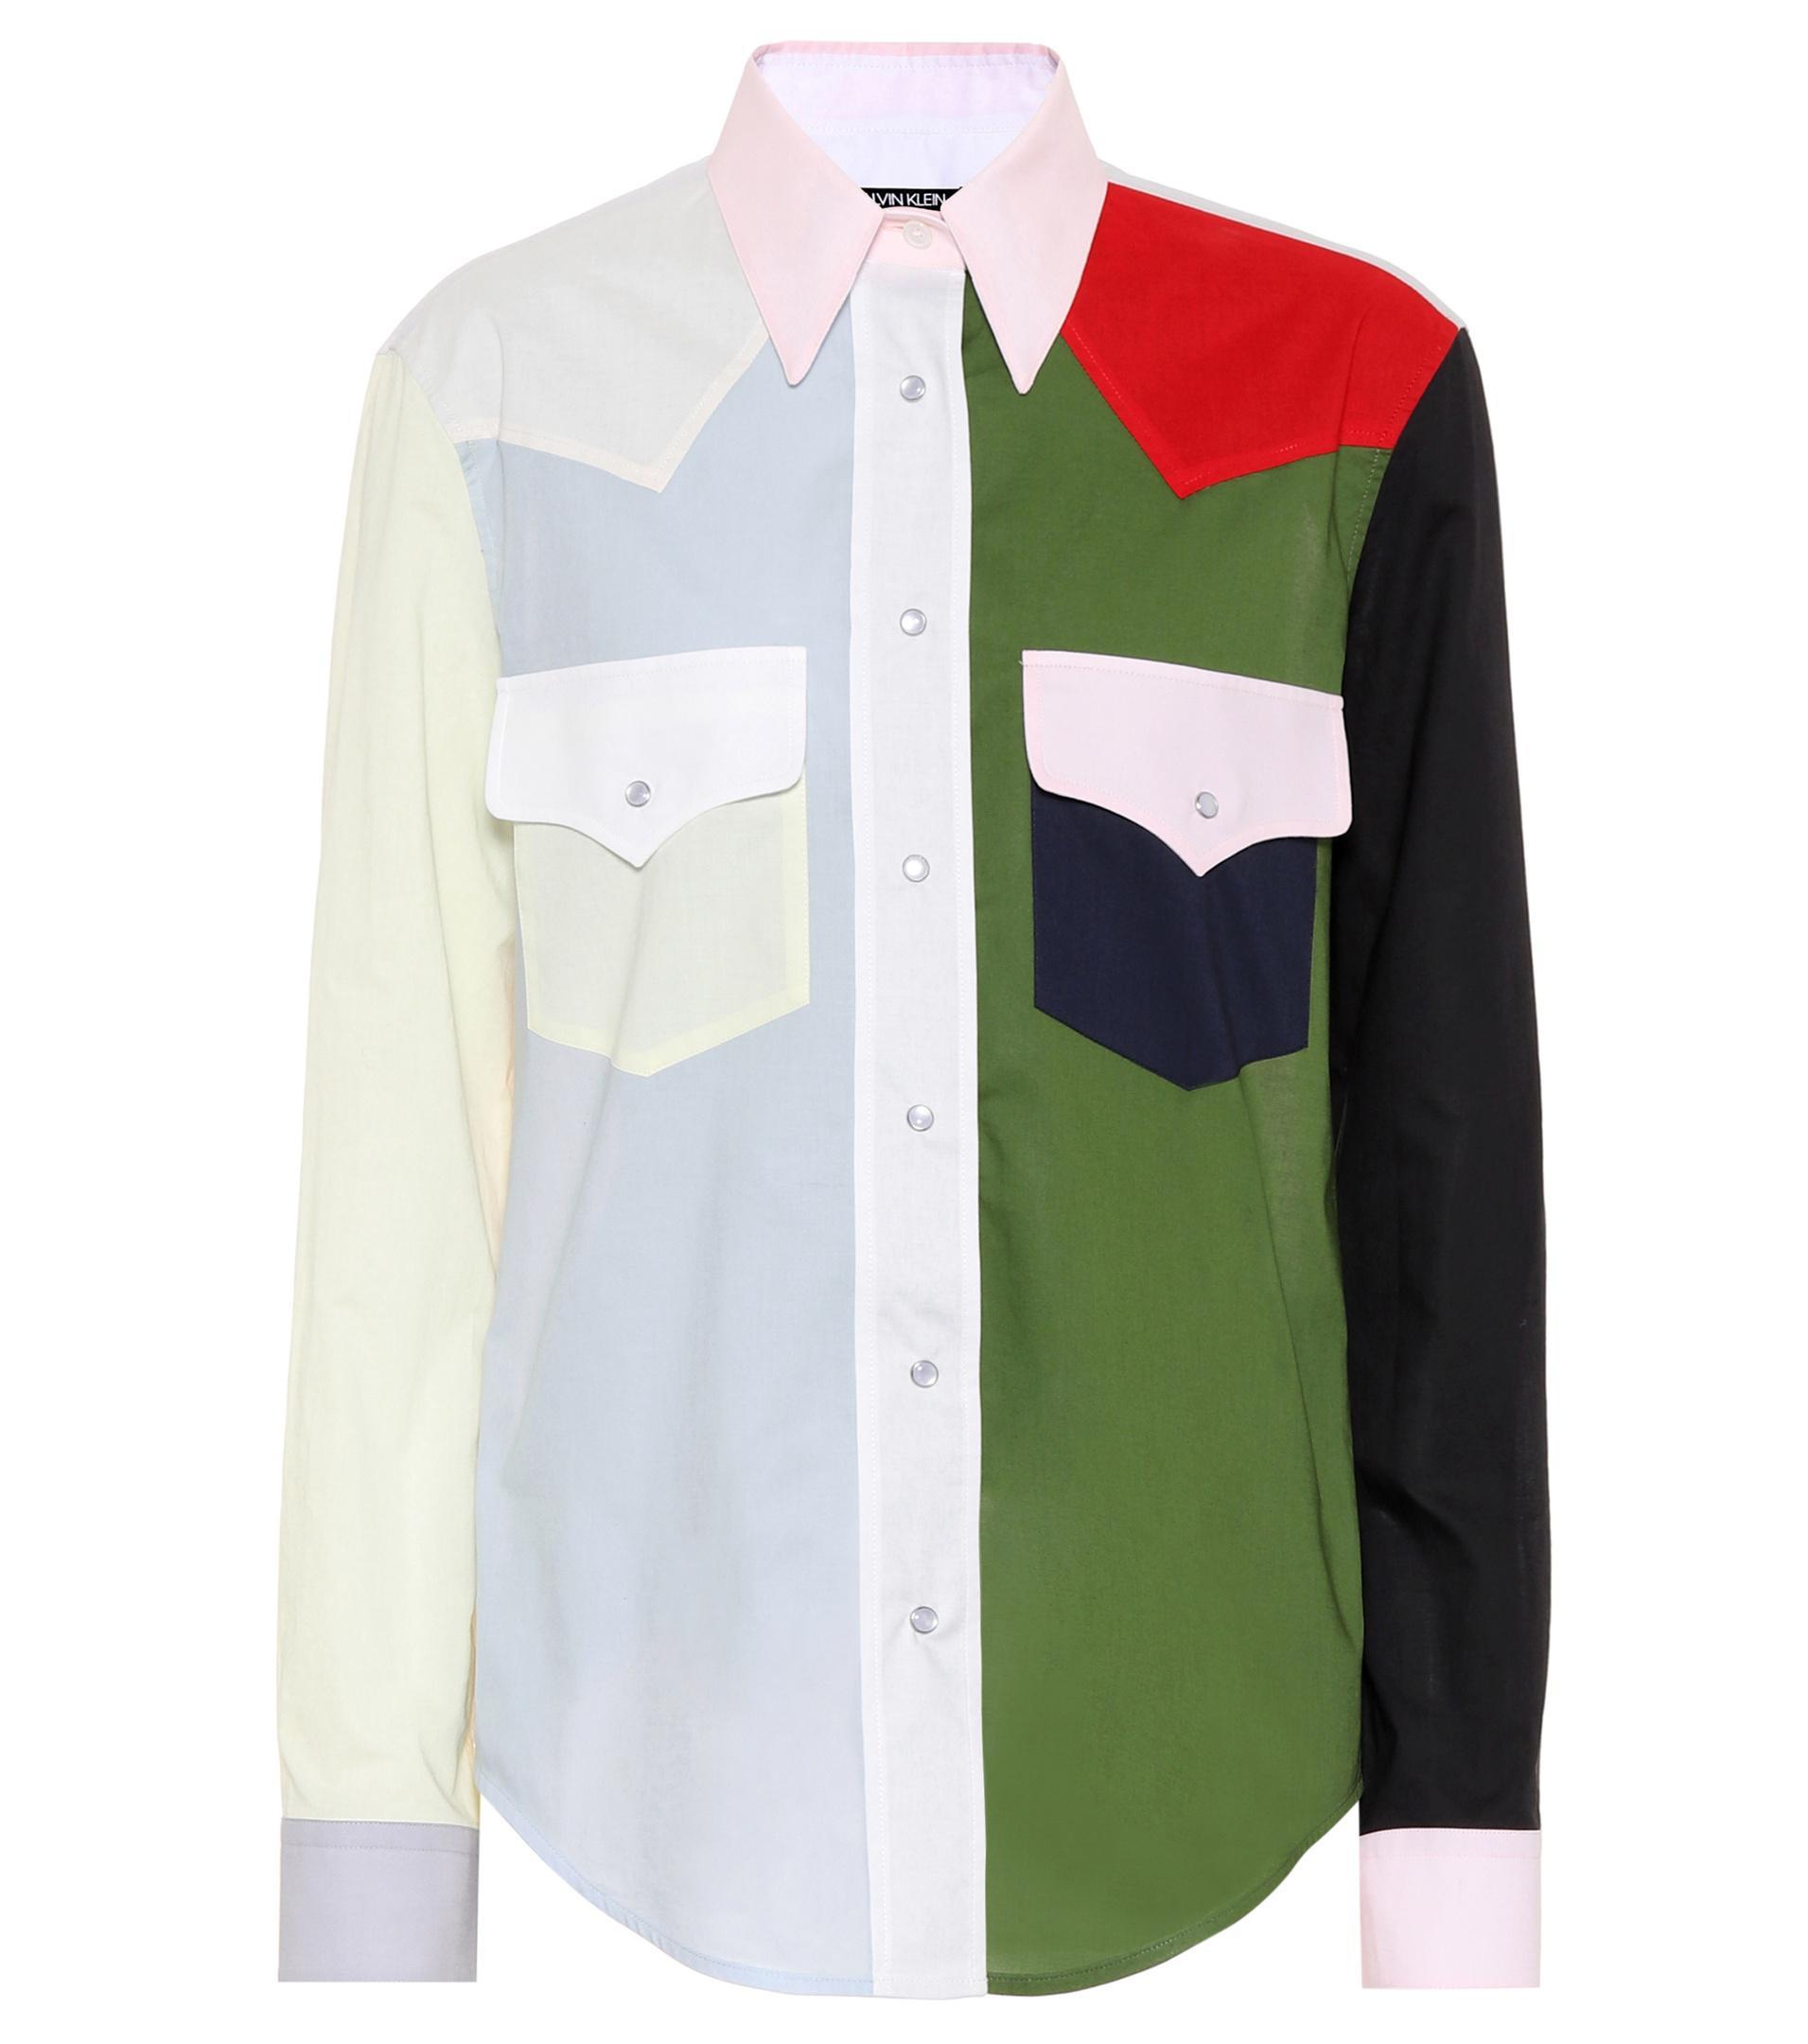 colour-block western shirt - Multicolour CALVIN KLEIN 205W39NYC Discount For Nice DFAIy0DomV